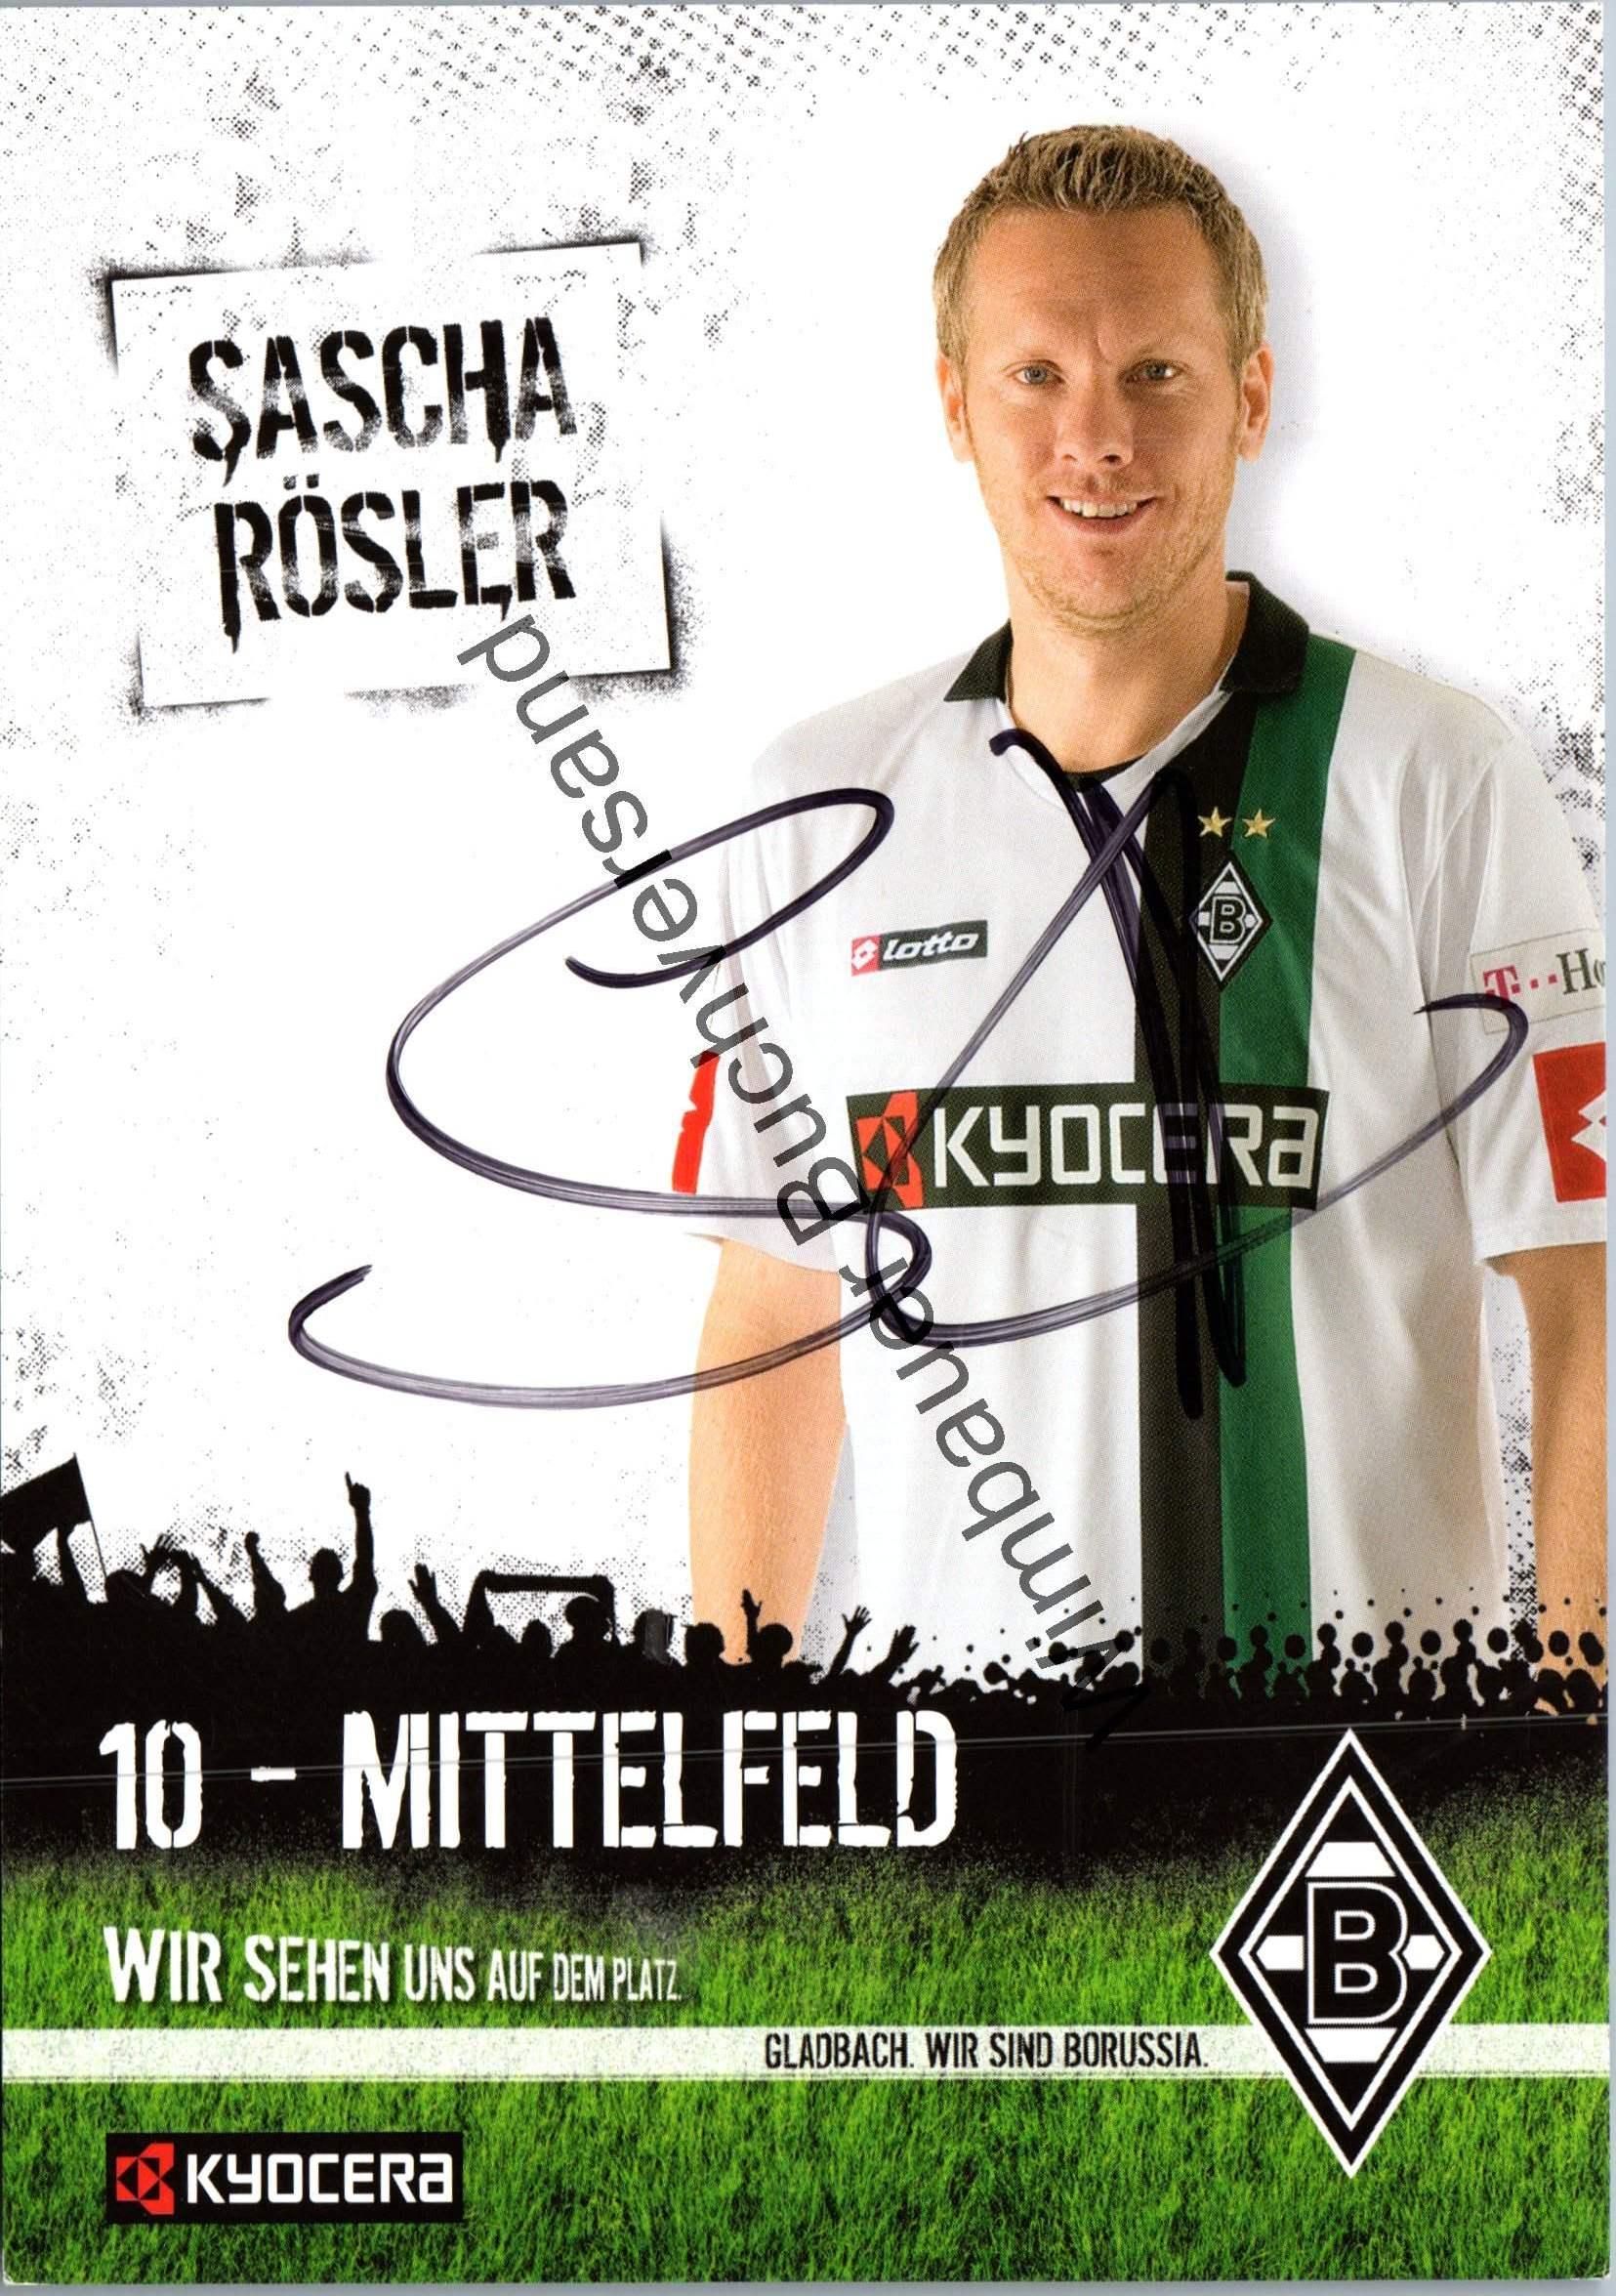 Rösler, Sascha : Original Autogramm Sascha Rösler Borussia Mönchengladbach /// Autograph signiert signed signee